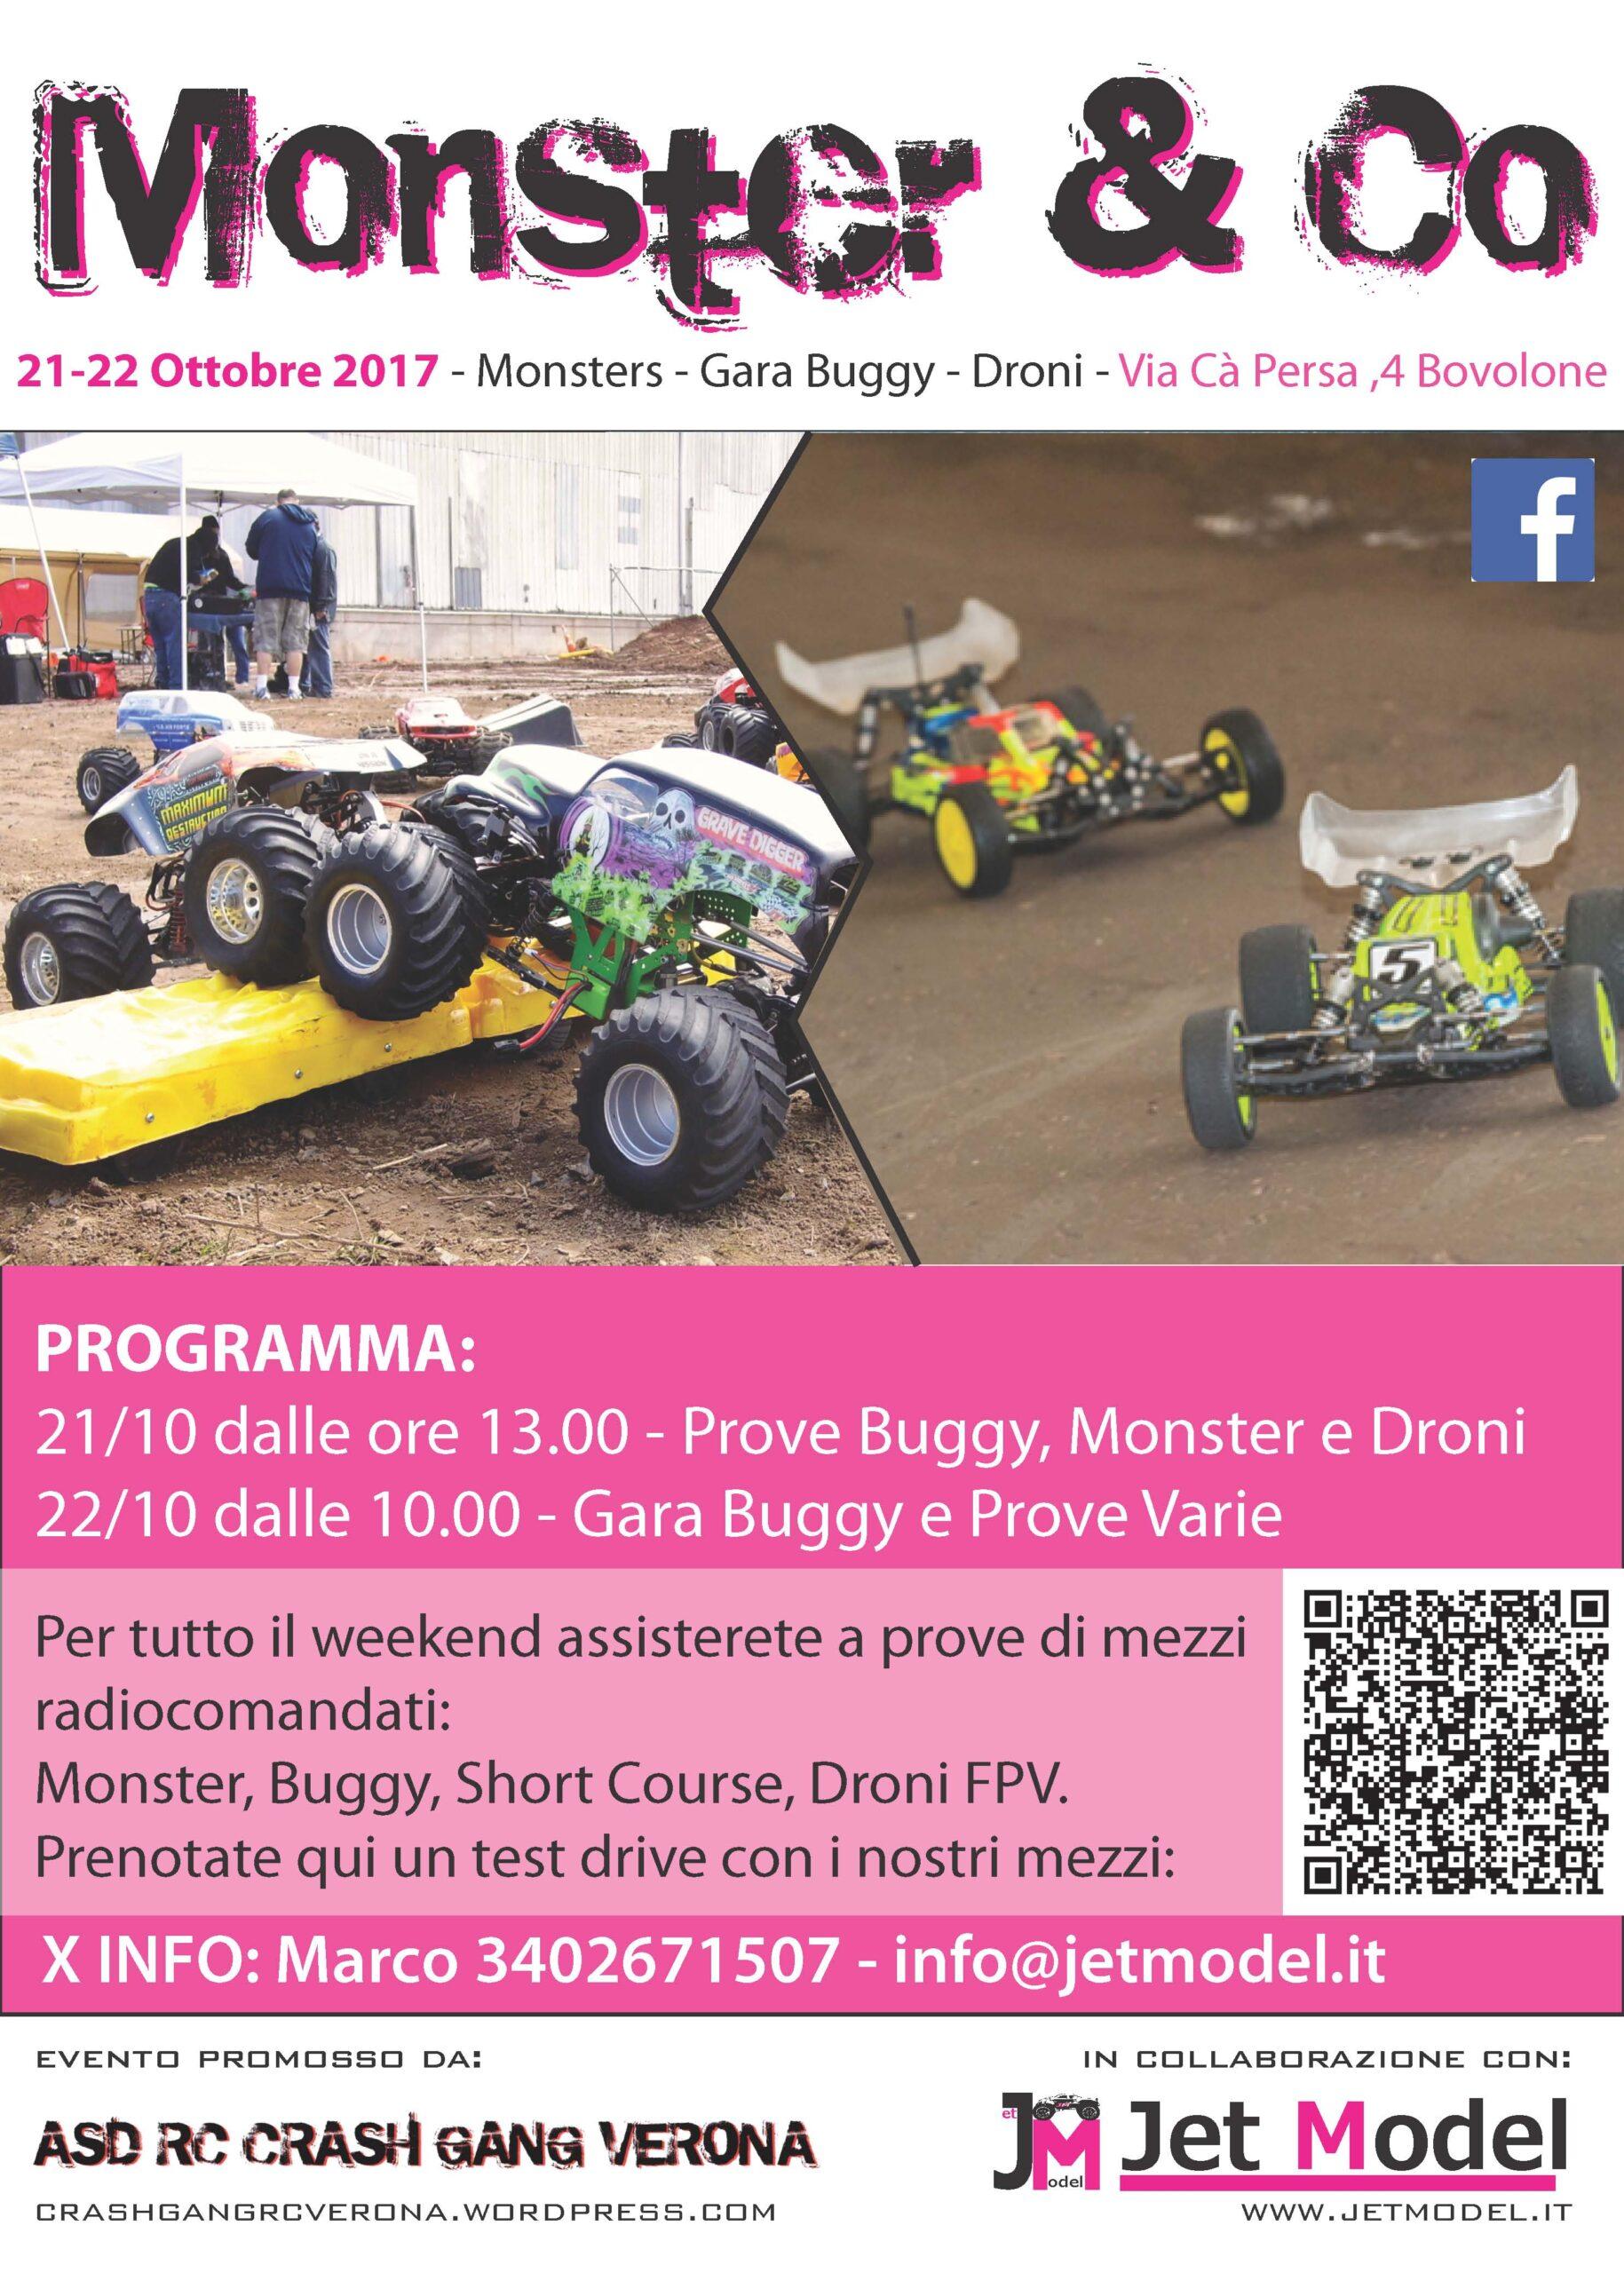 droni buggy monster modellismo